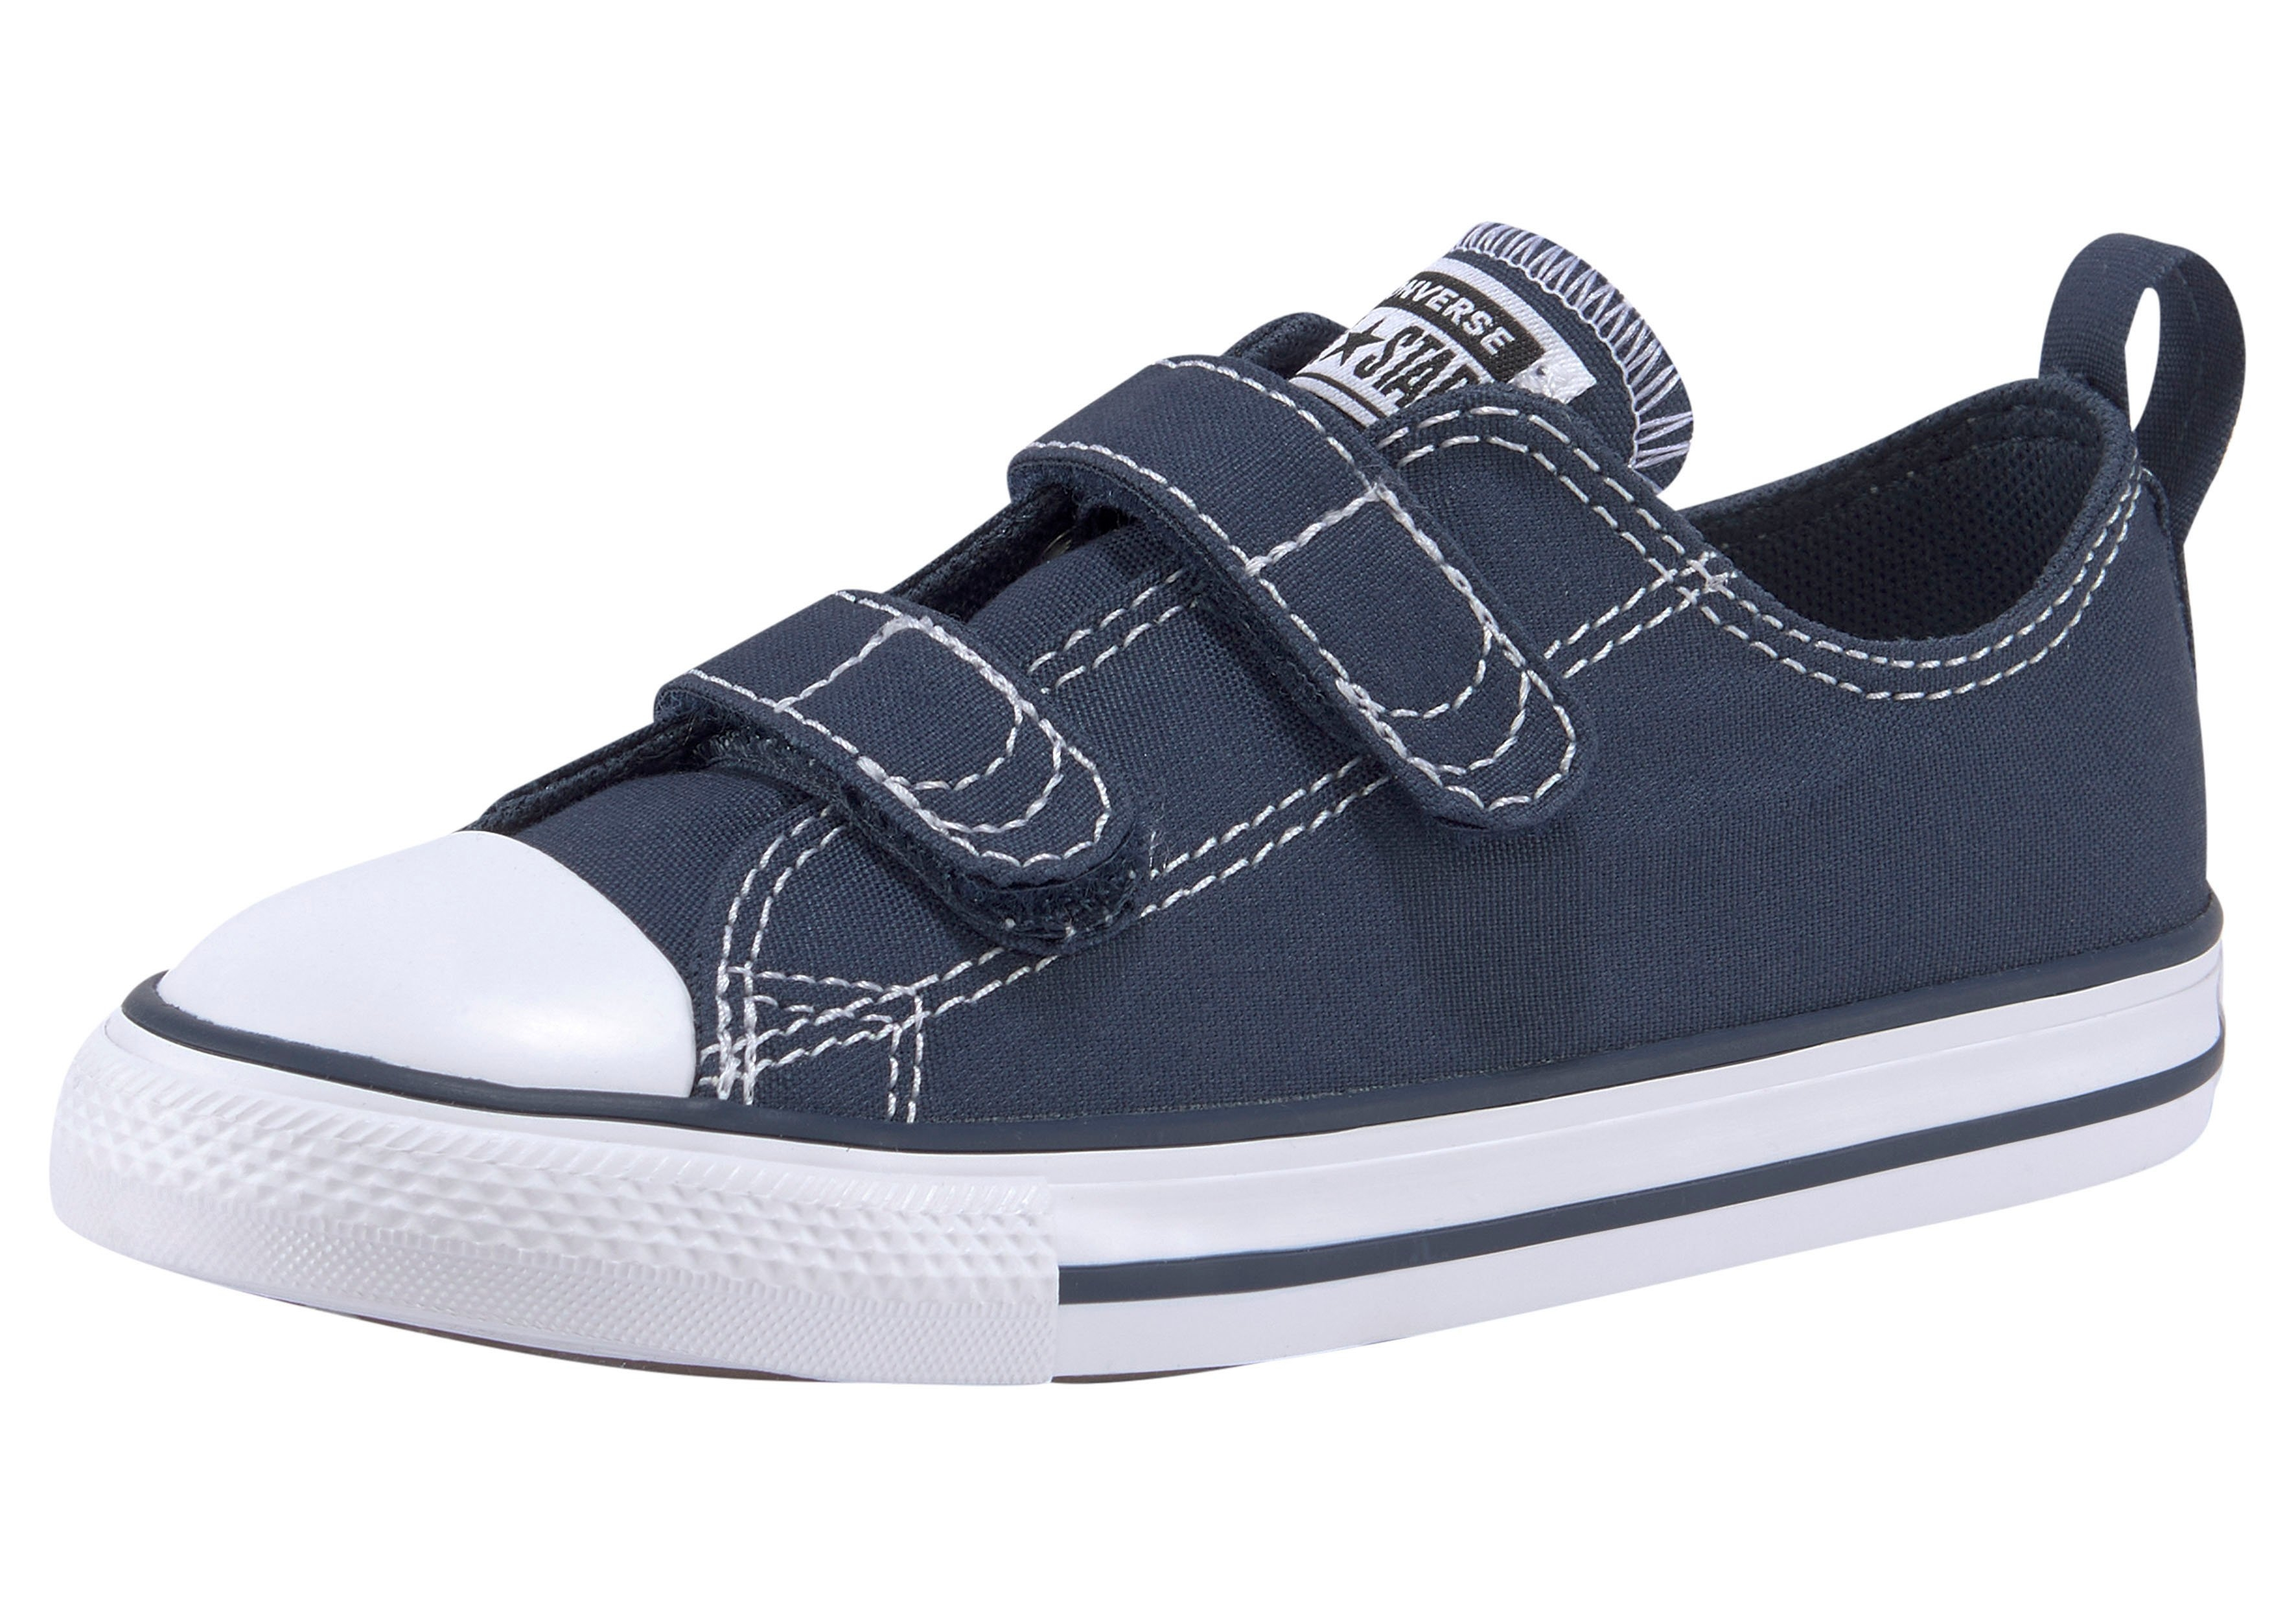 Converse sneakers CHUCK TAYLOR ALL STAR 2V - OX nu online kopen bij OTTO